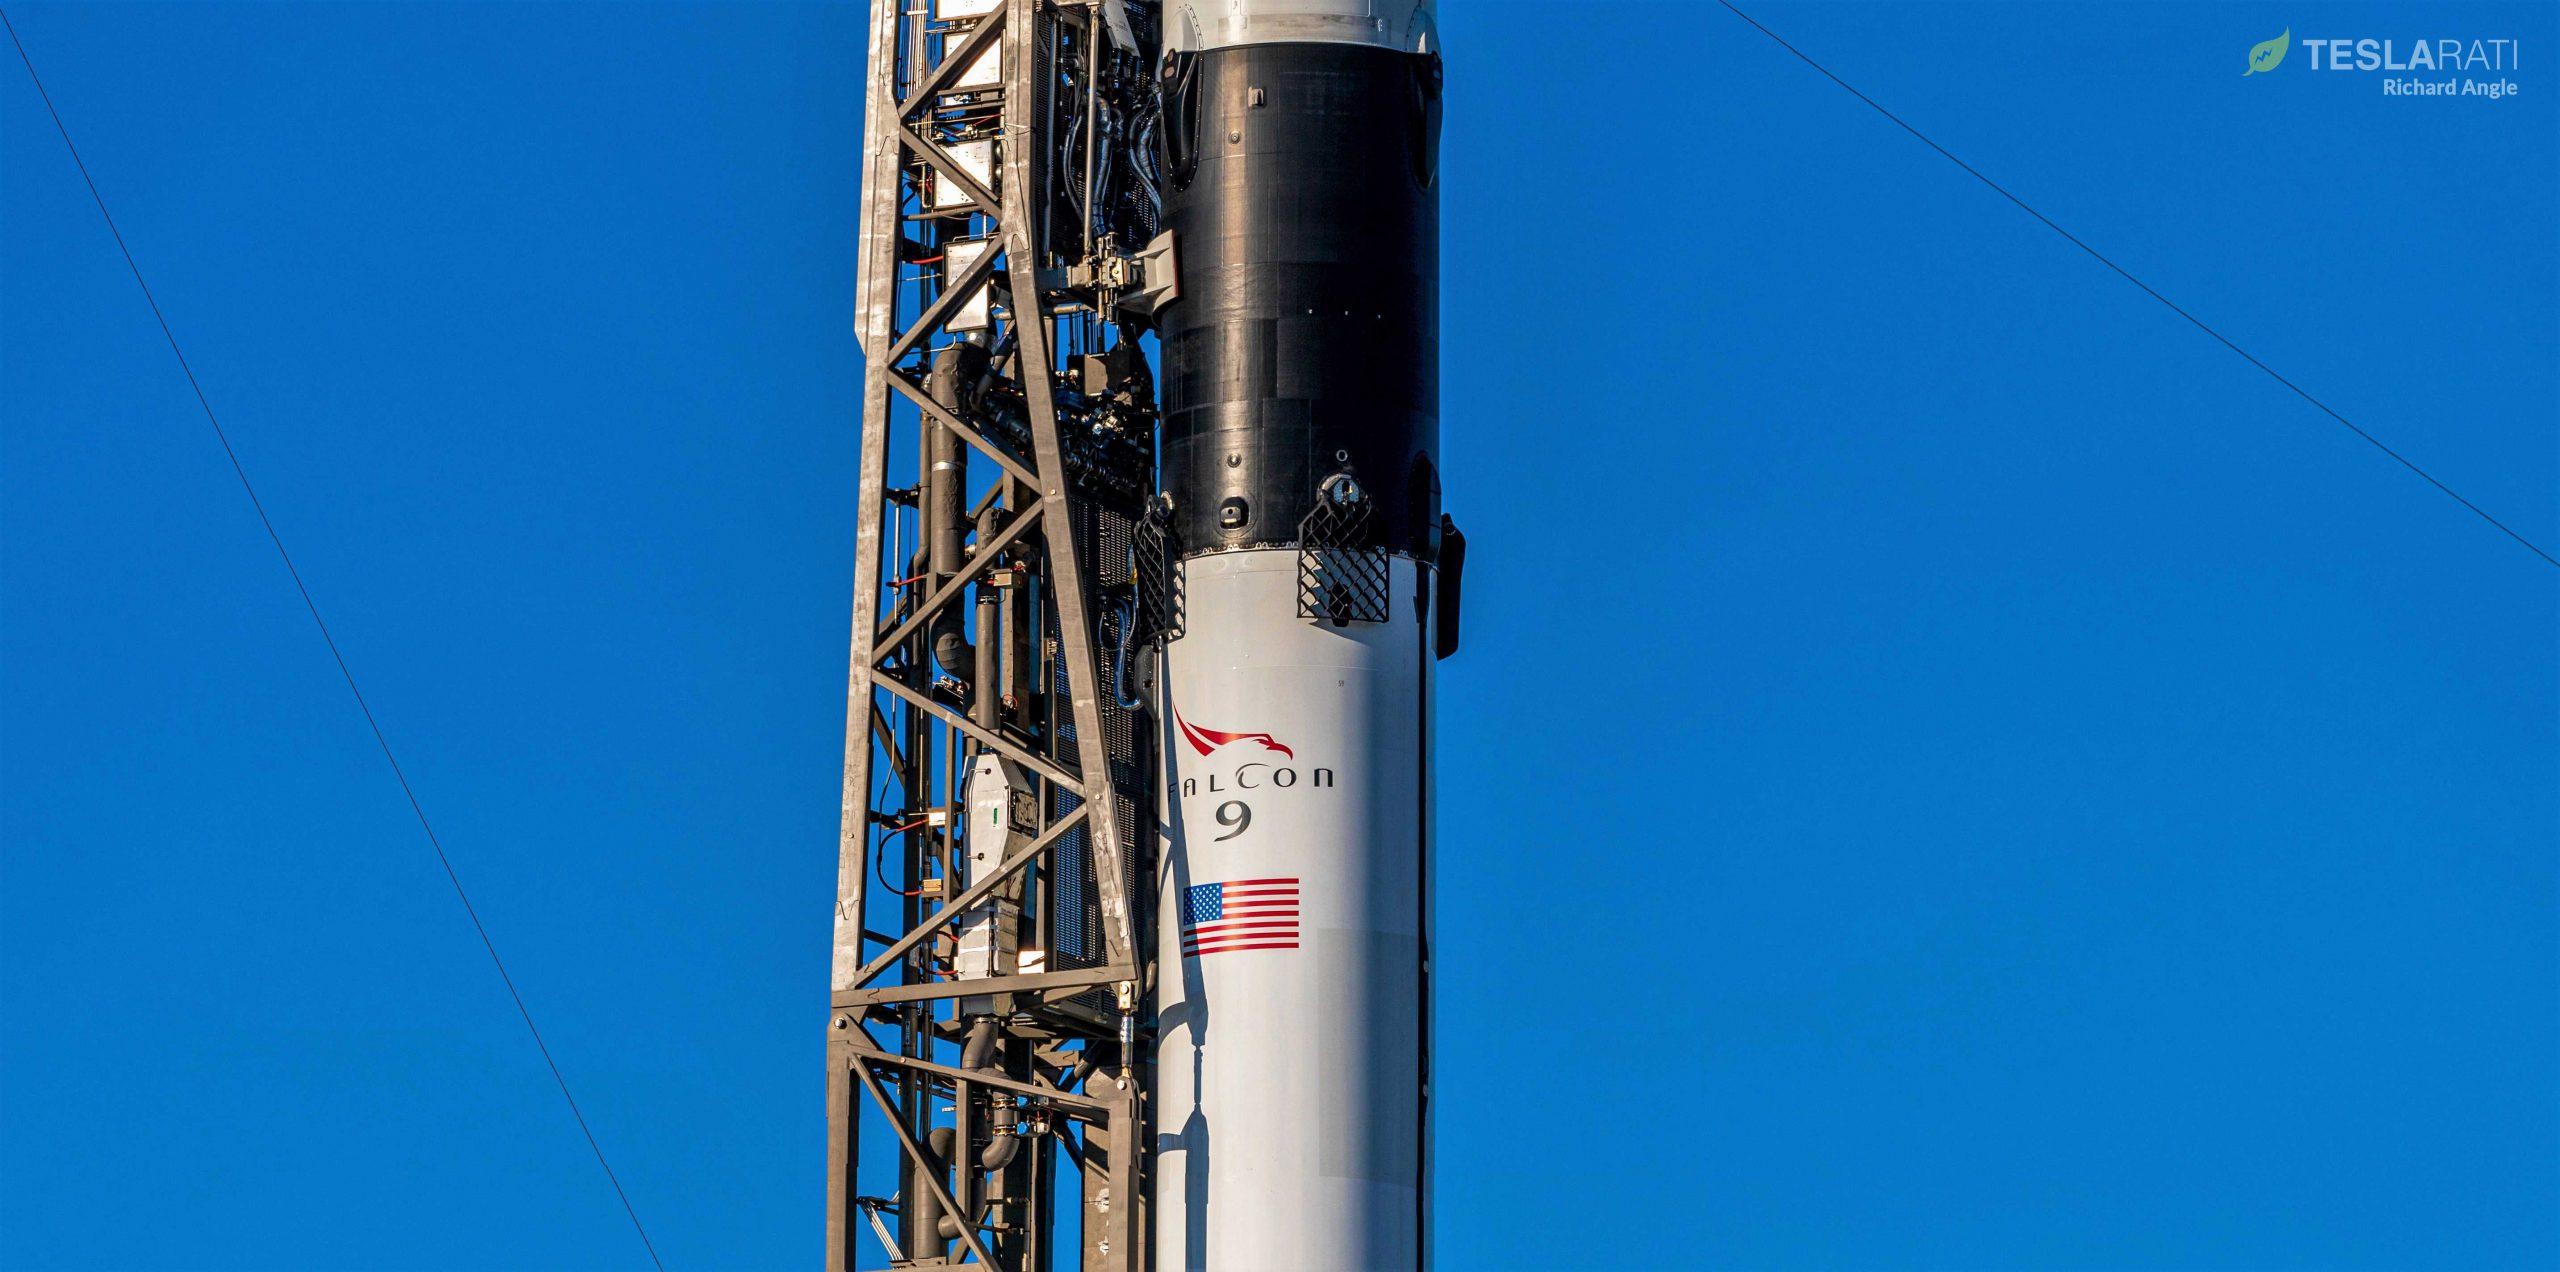 CRS-19 C106 Falcon 9 B1059 vertical LC-40 120419 (Richard Angle) (3) crop (c)